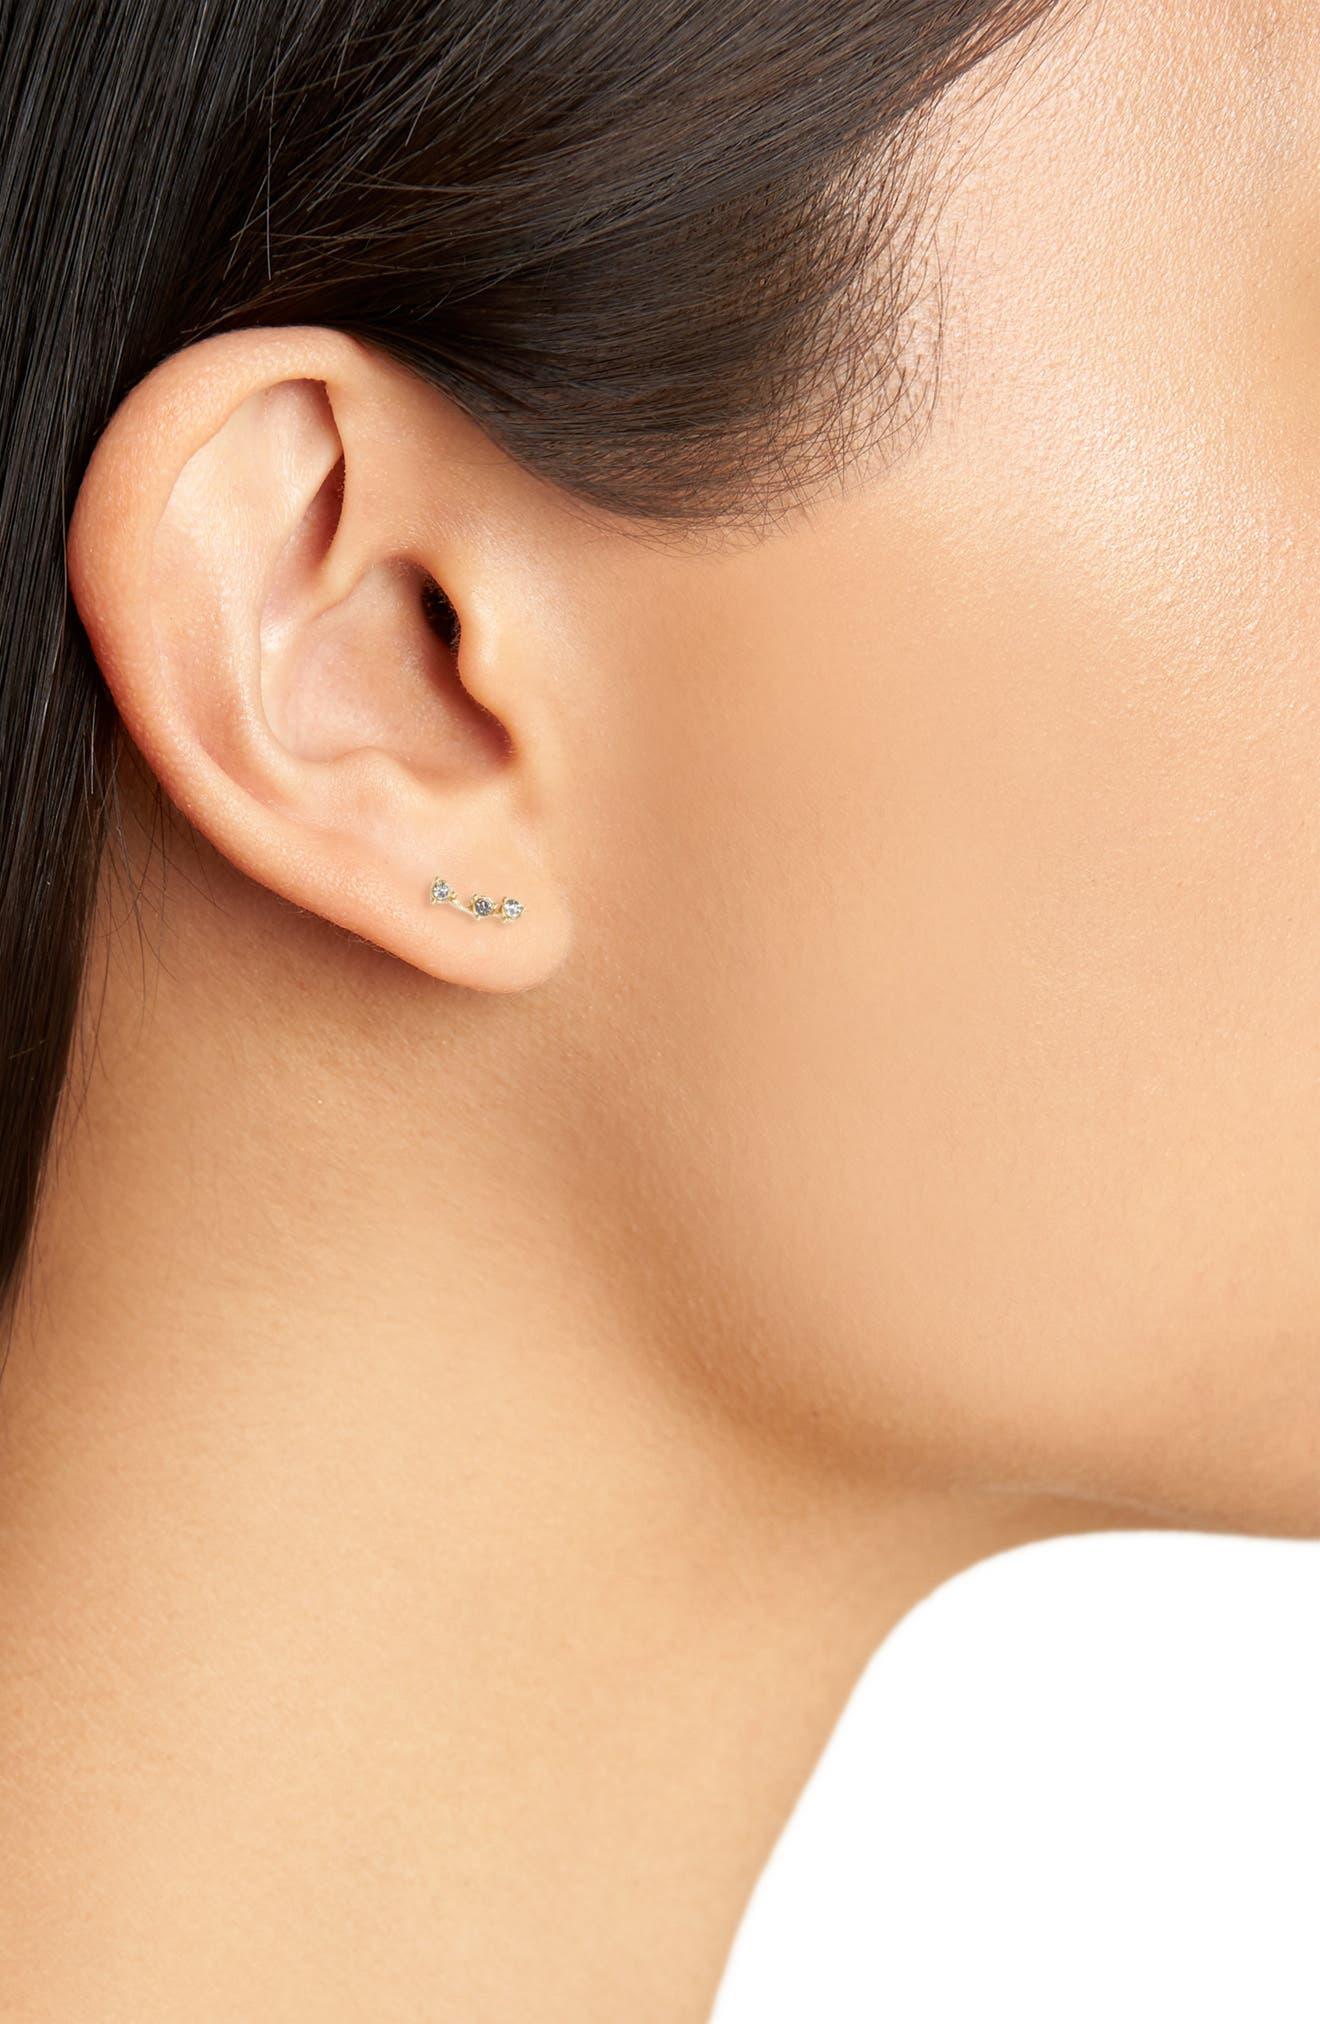 Gemline Stud Earrings,                             Alternate thumbnail 2, color,                             001